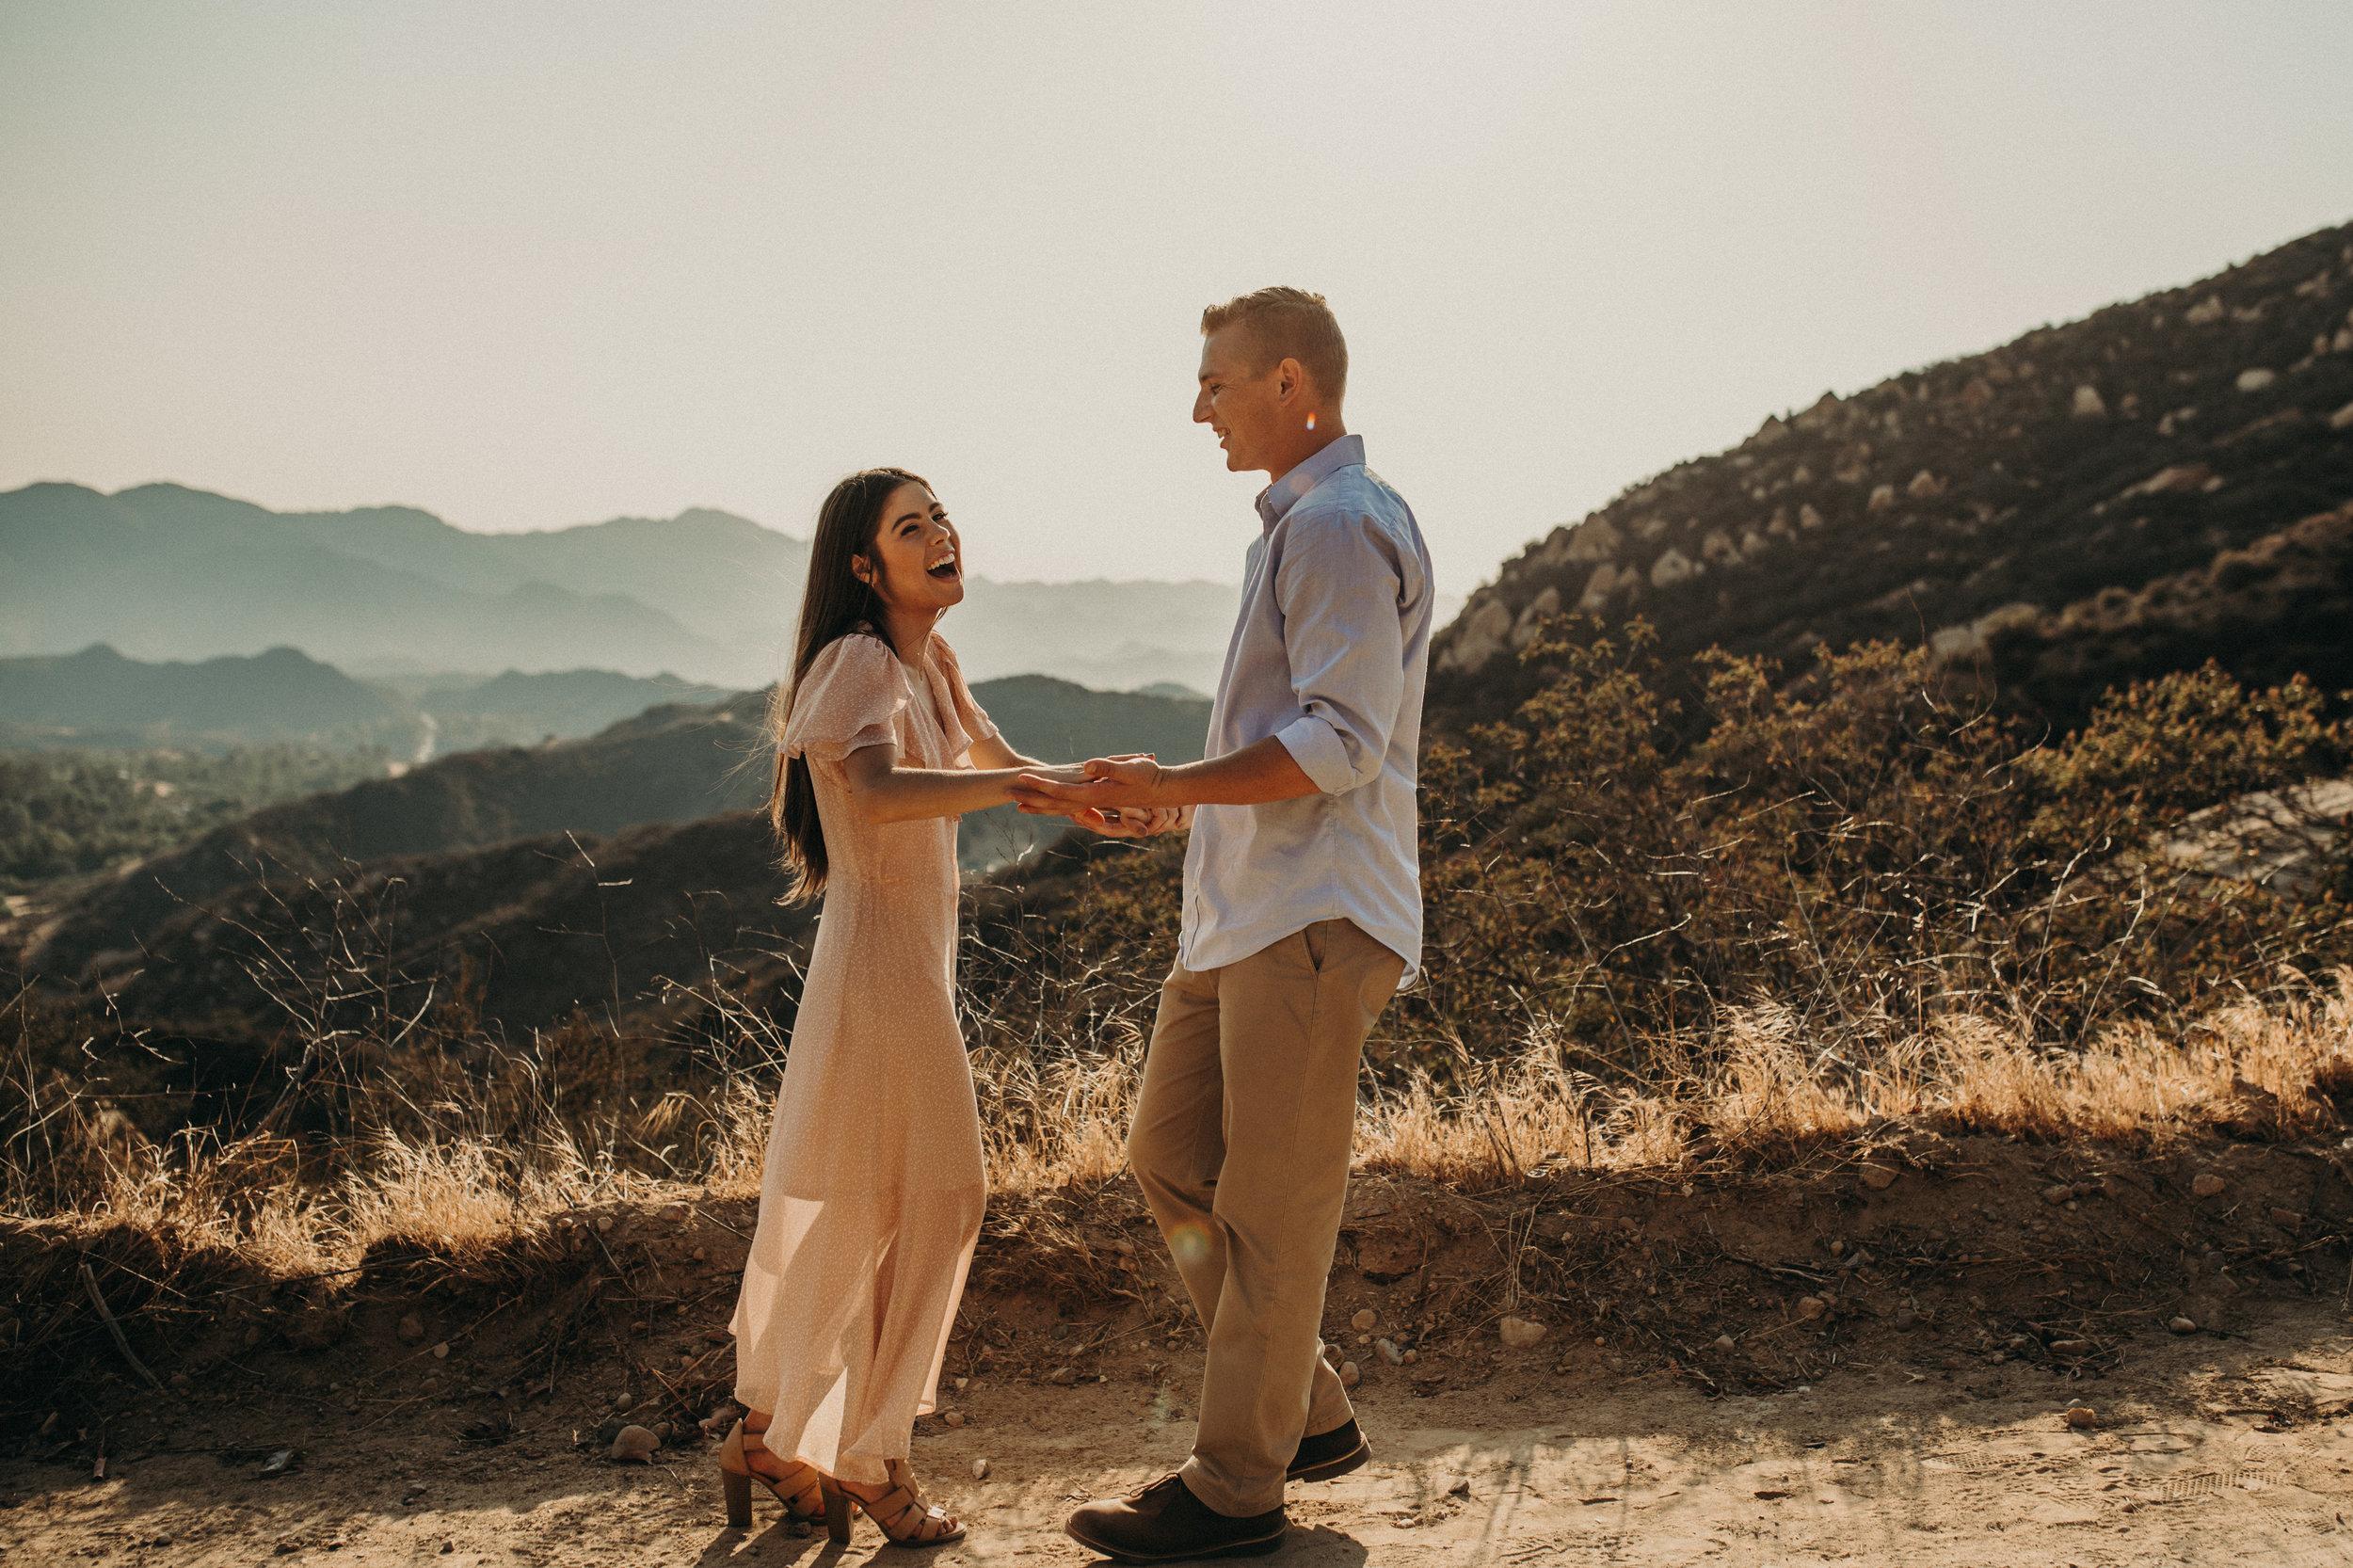 ERICA + CAMERON - Engagement shoot in Malibu, CA